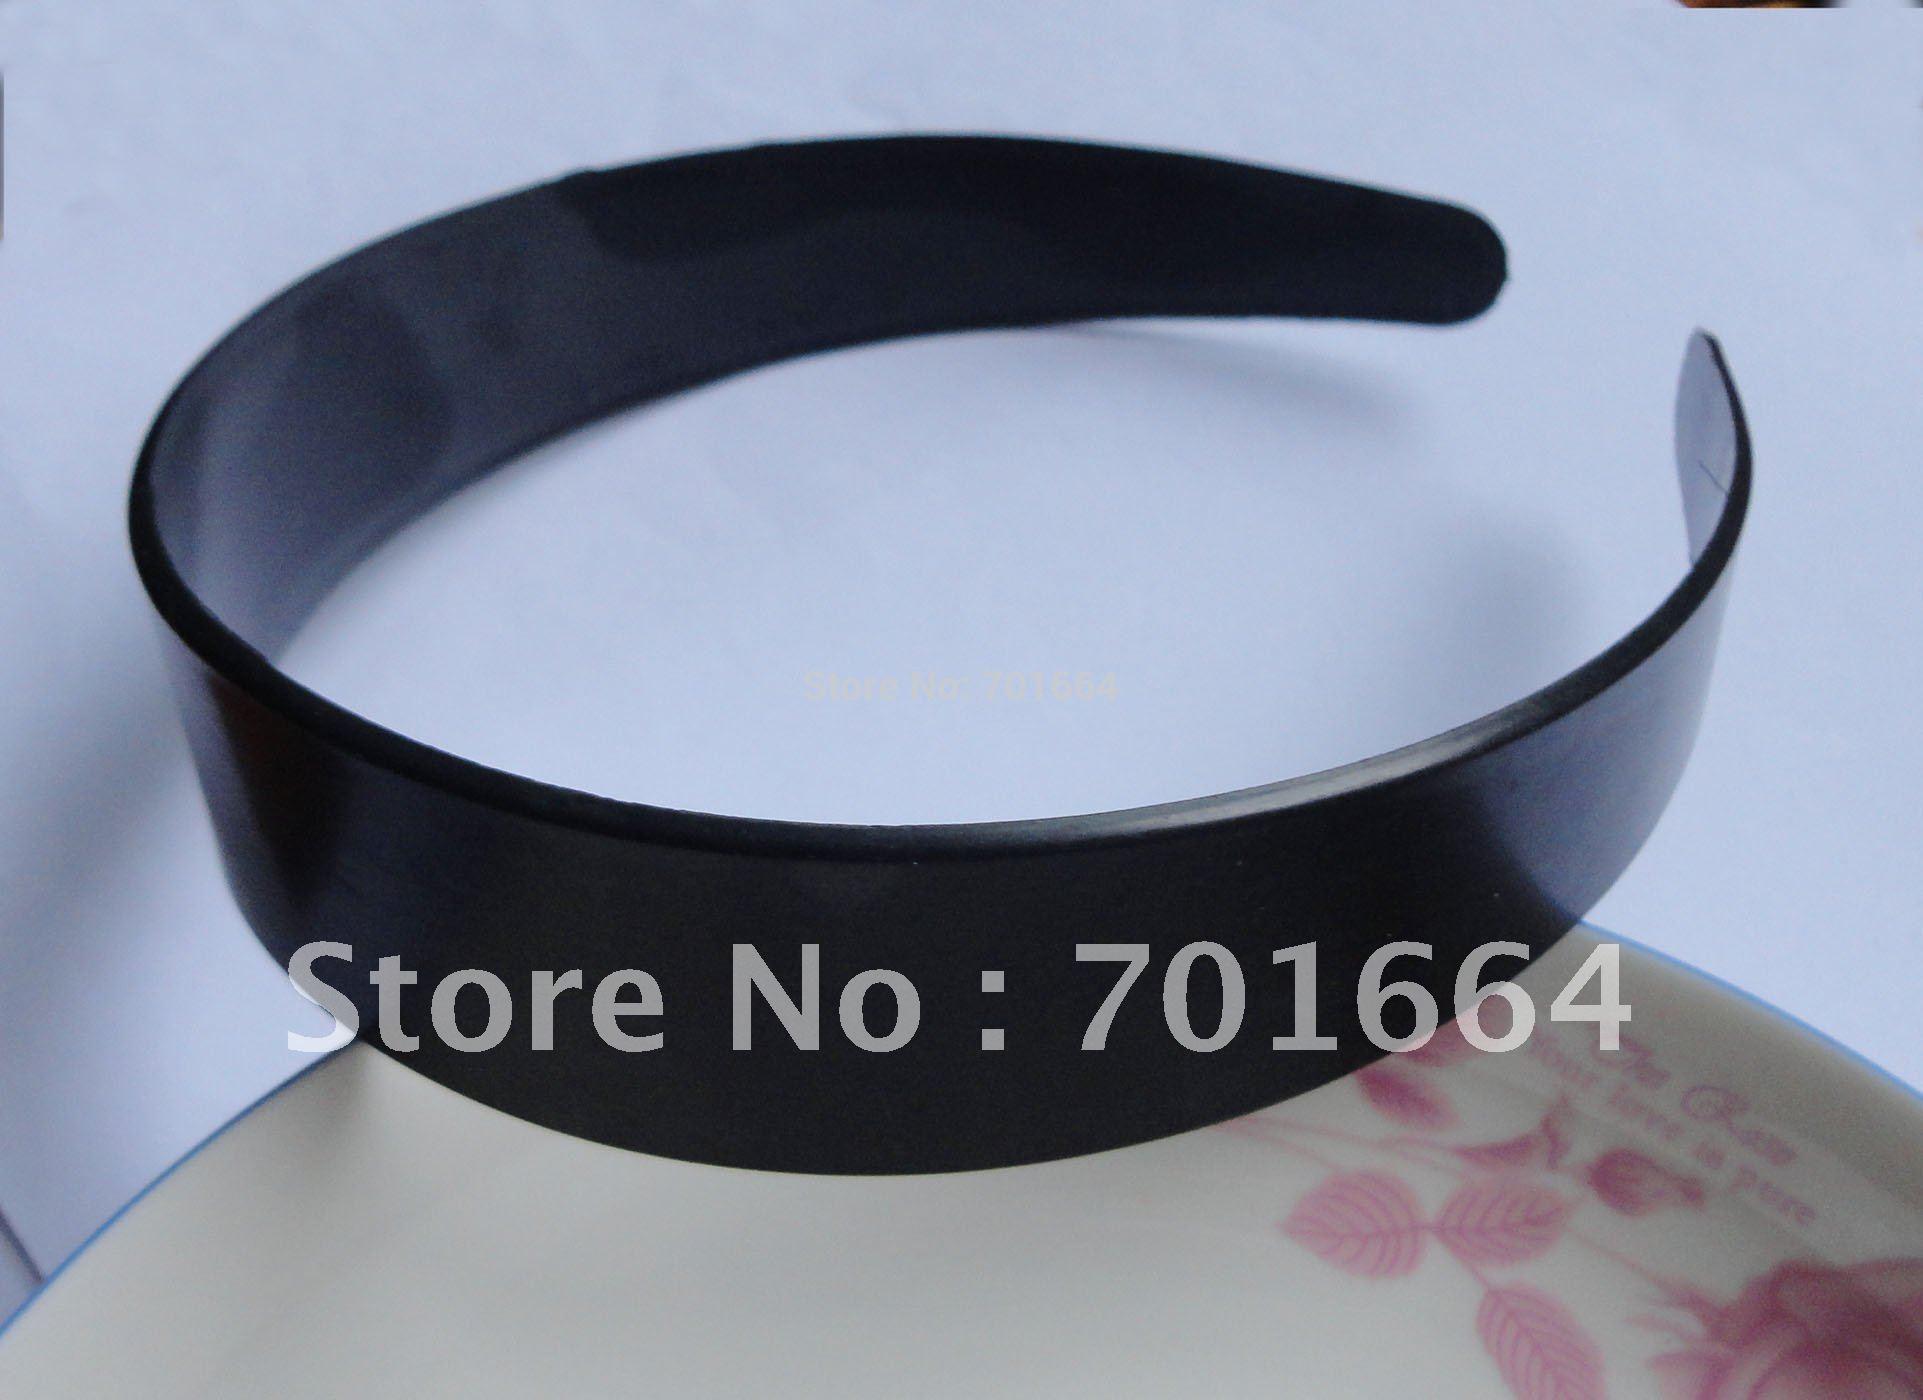 "10PCS 3.0cm 1.15"" Black No Teeth Plain Plastic Hair Headbands as DIY accessories,BARGAIN for BULK(China (Mainland))"